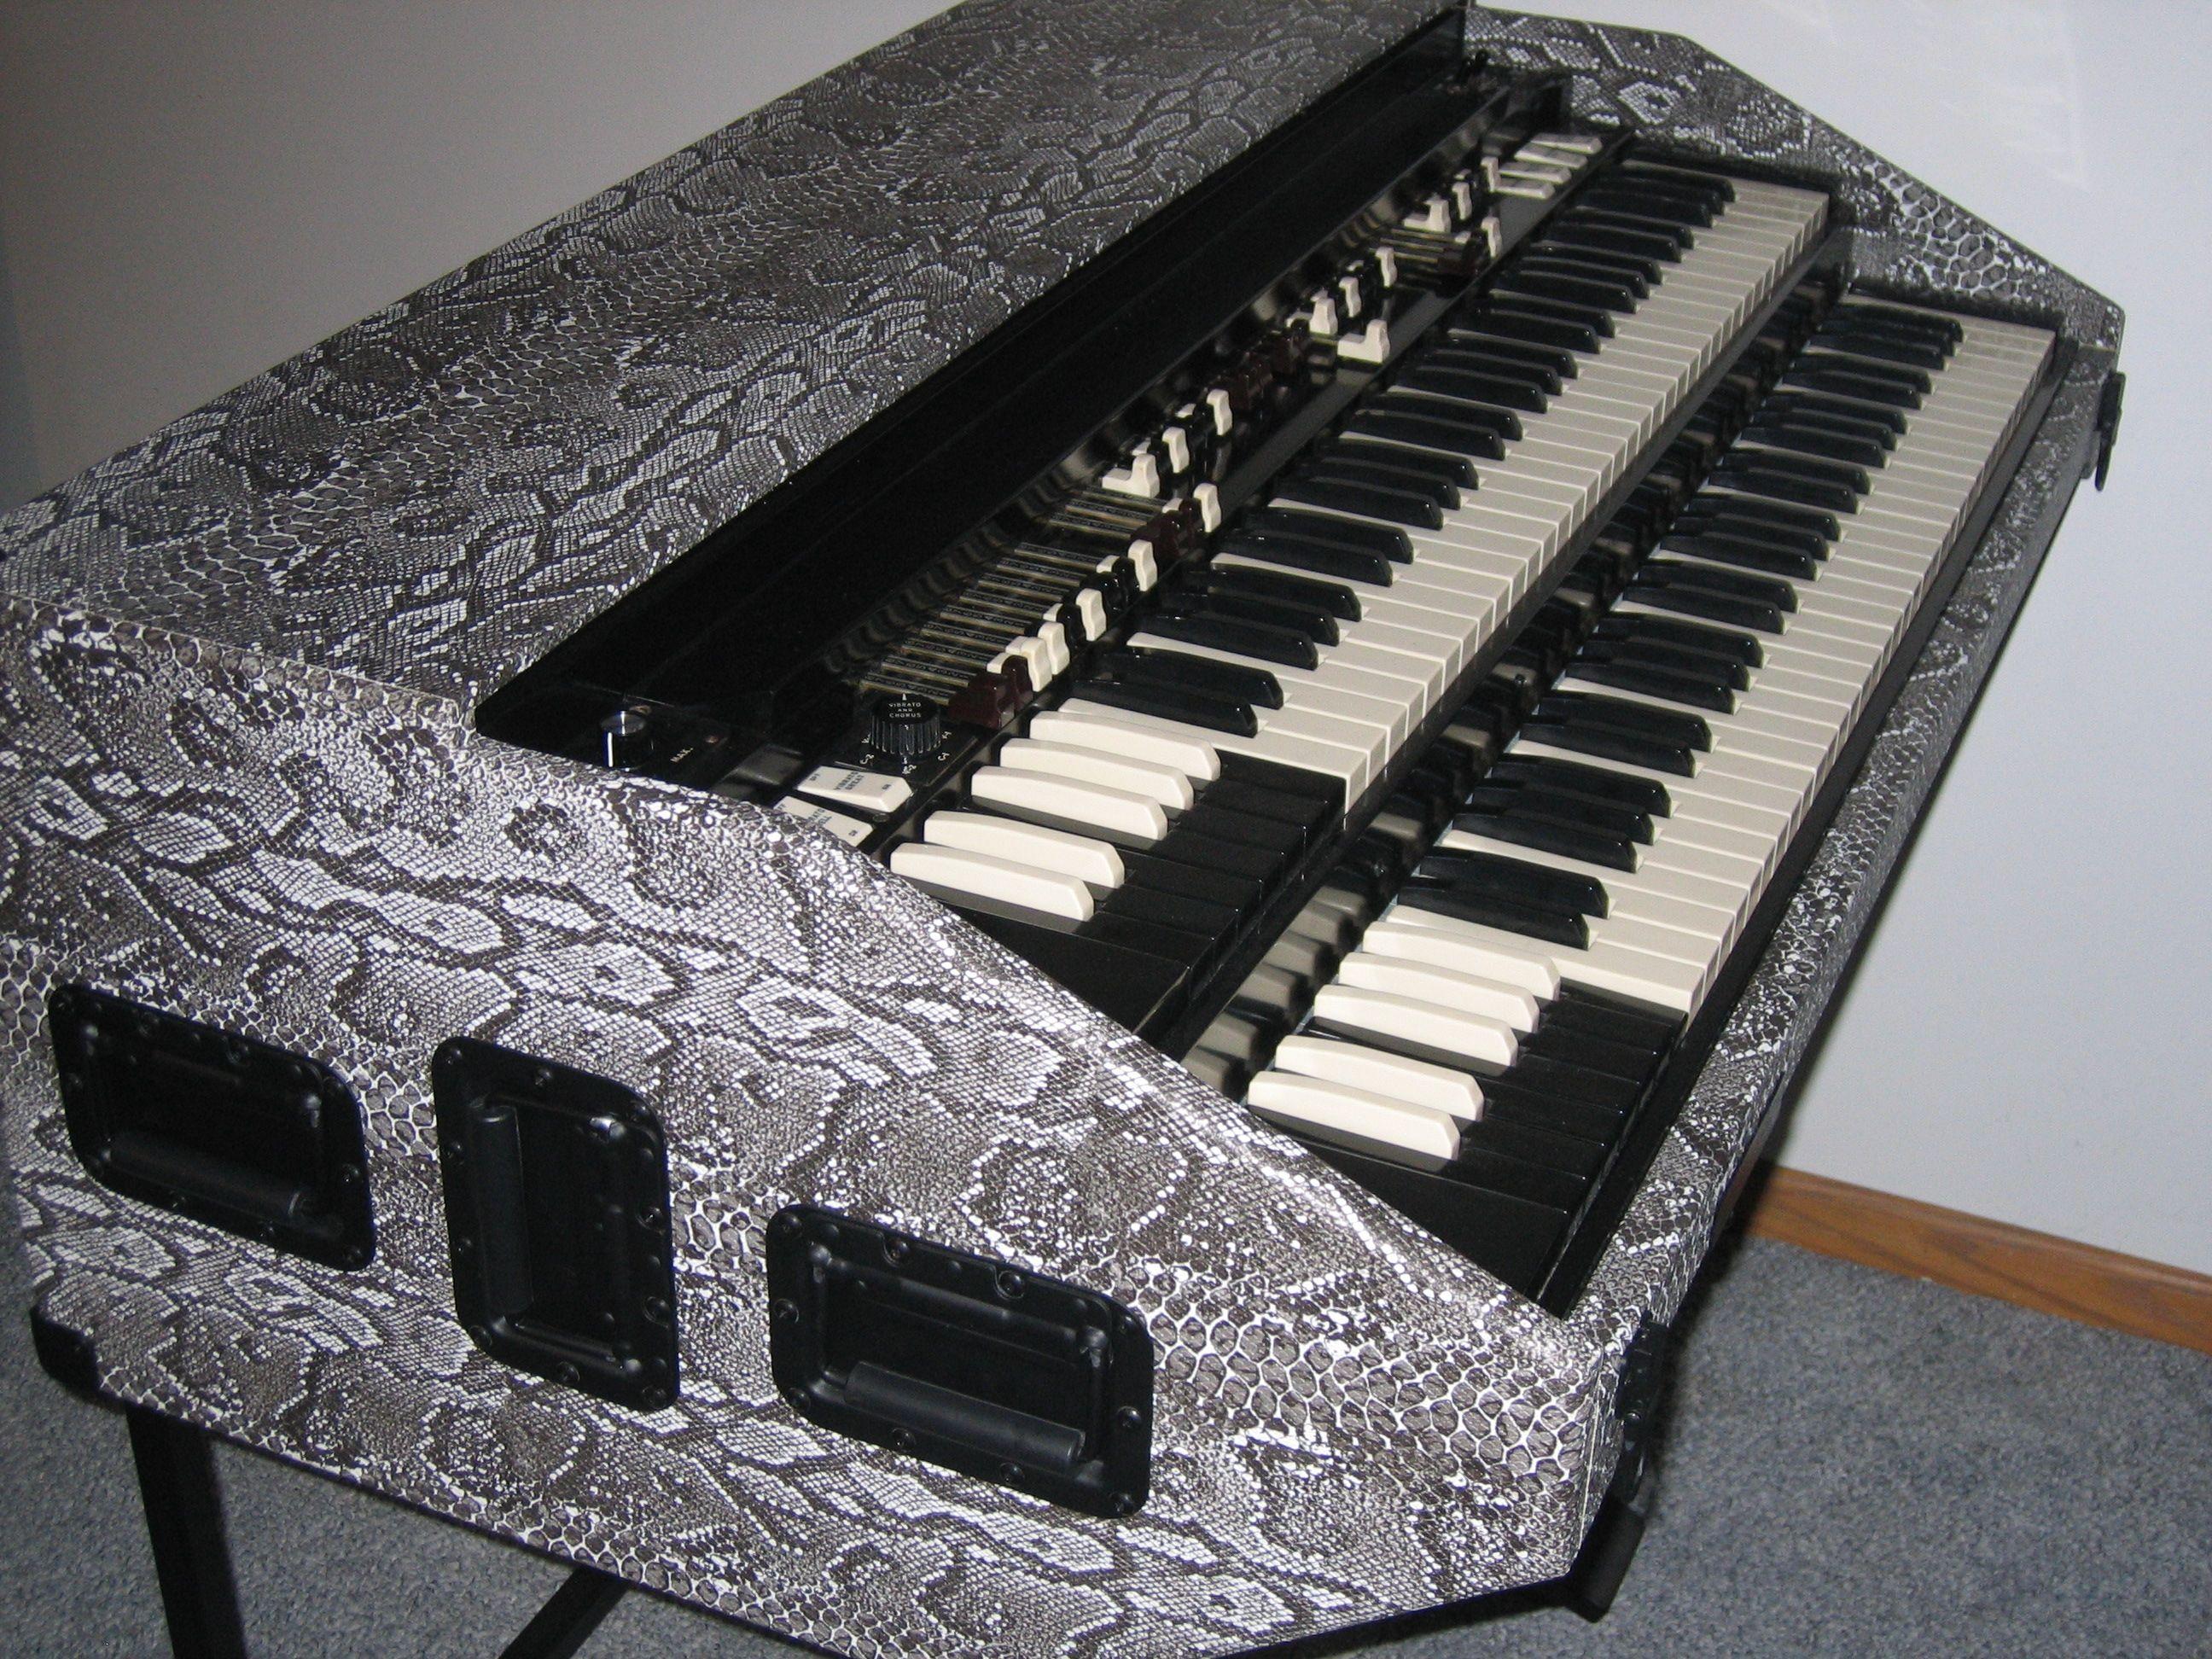 snake skin northern chop hammond organ portable by bb organ music em 2019. Black Bedroom Furniture Sets. Home Design Ideas